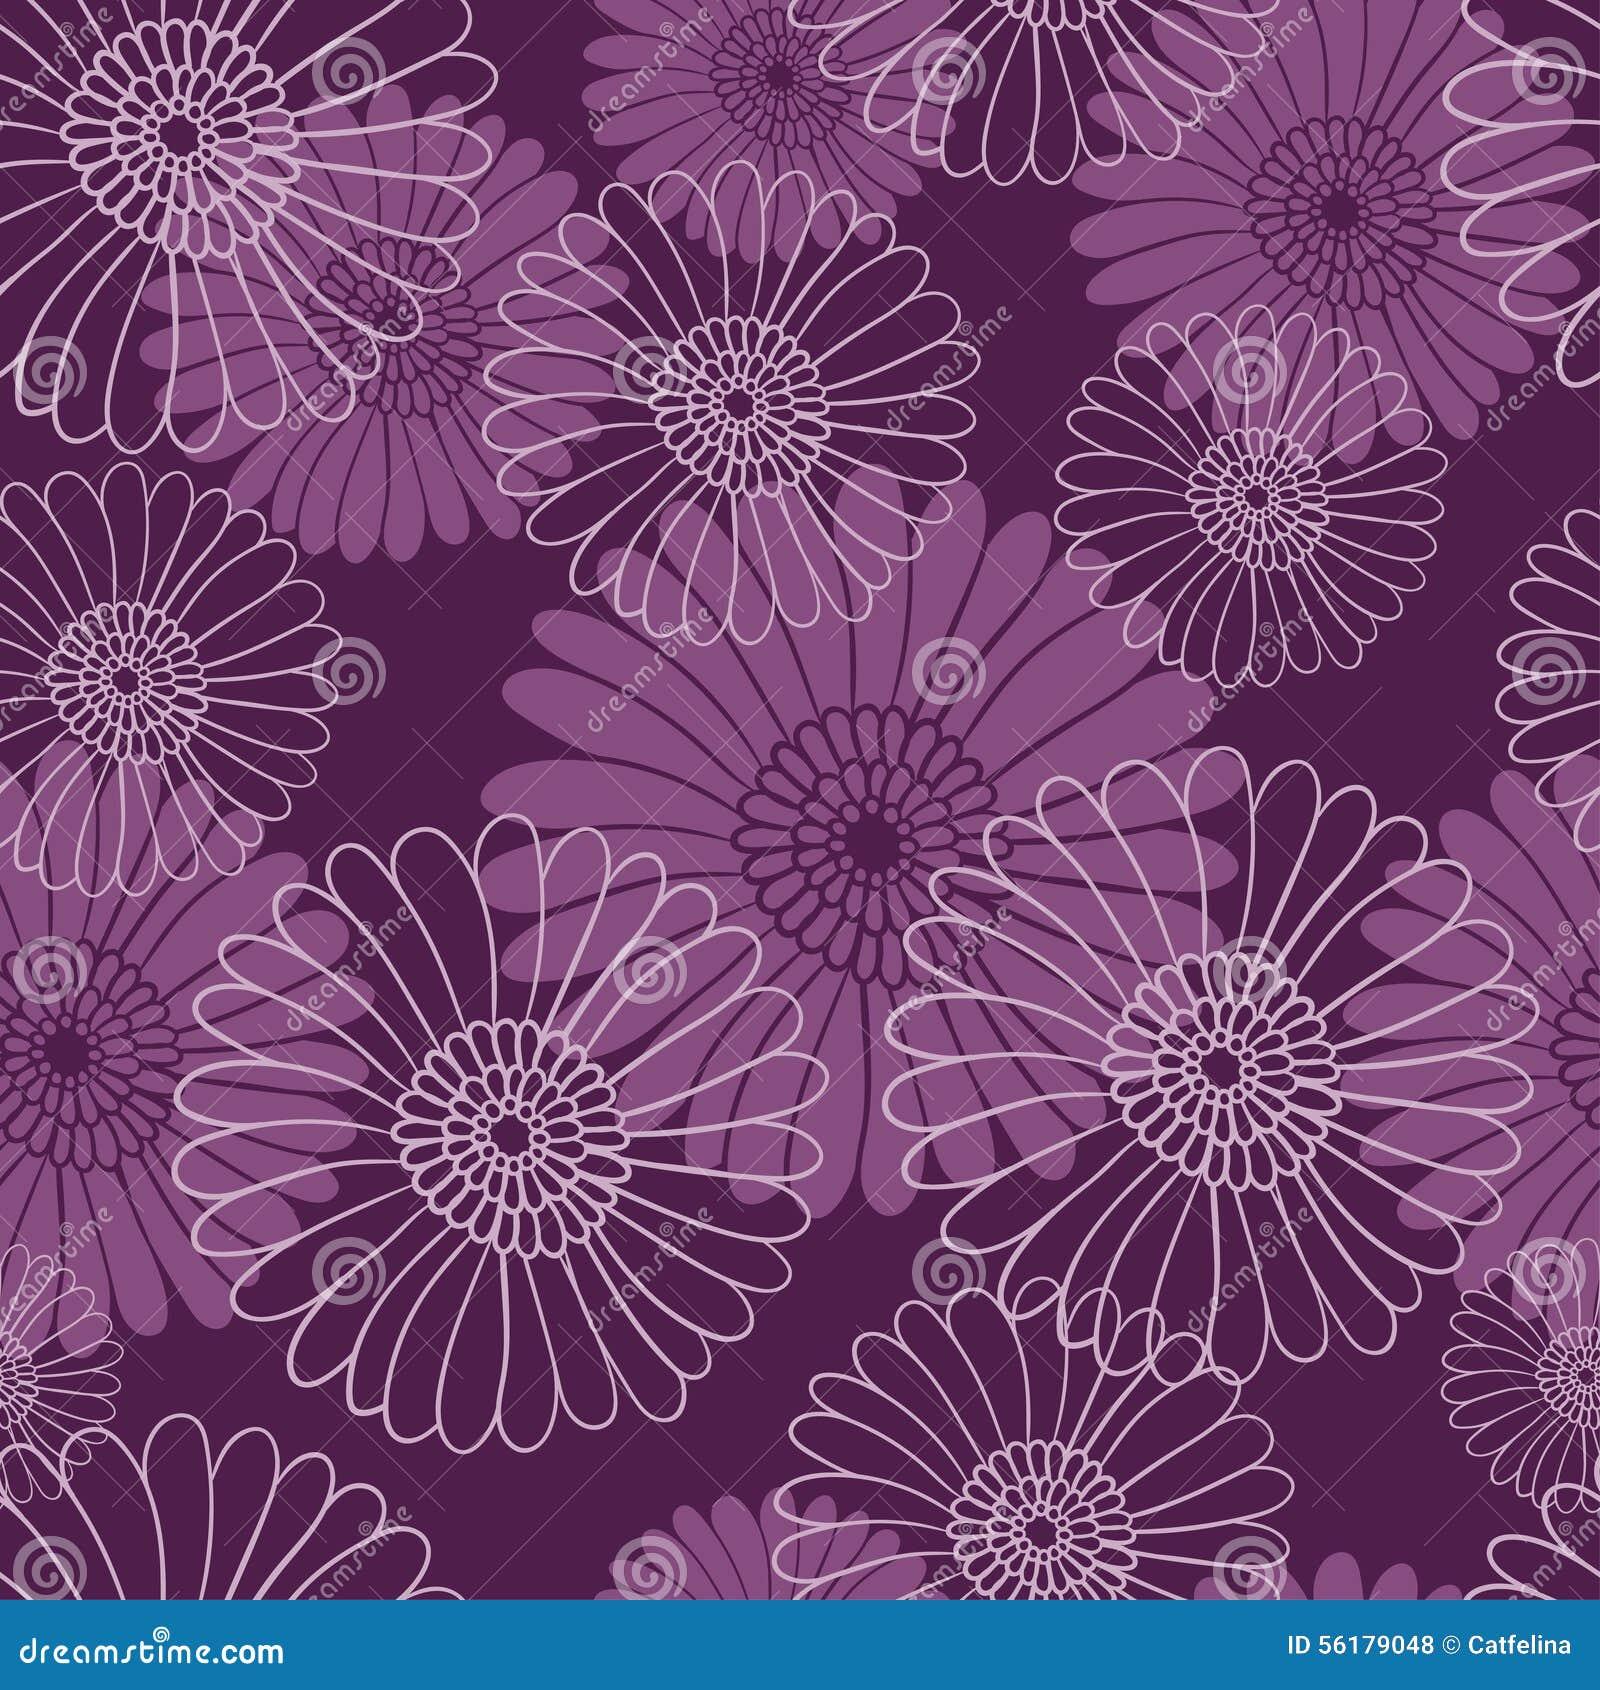 Seamless Flower Pattern On Dark Violet Background Stock Vector